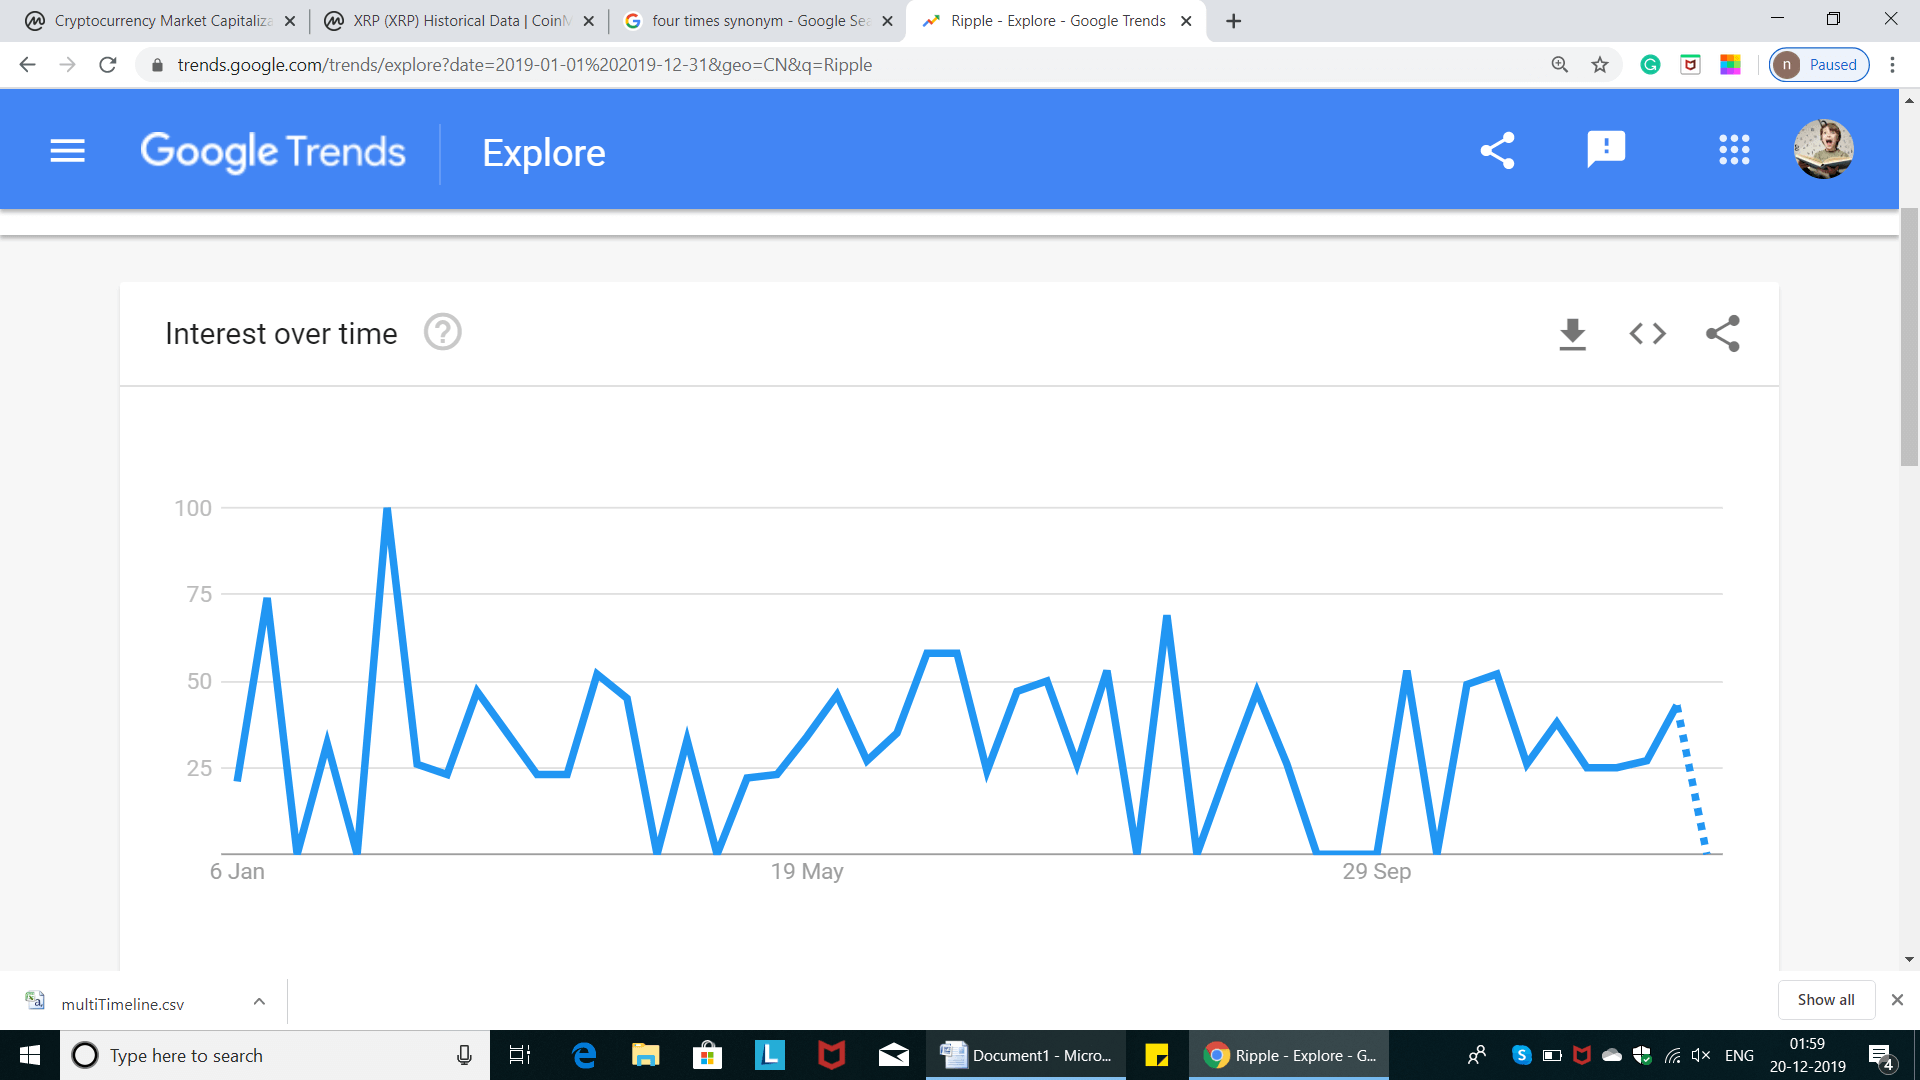 Ripple YTD Trend in China